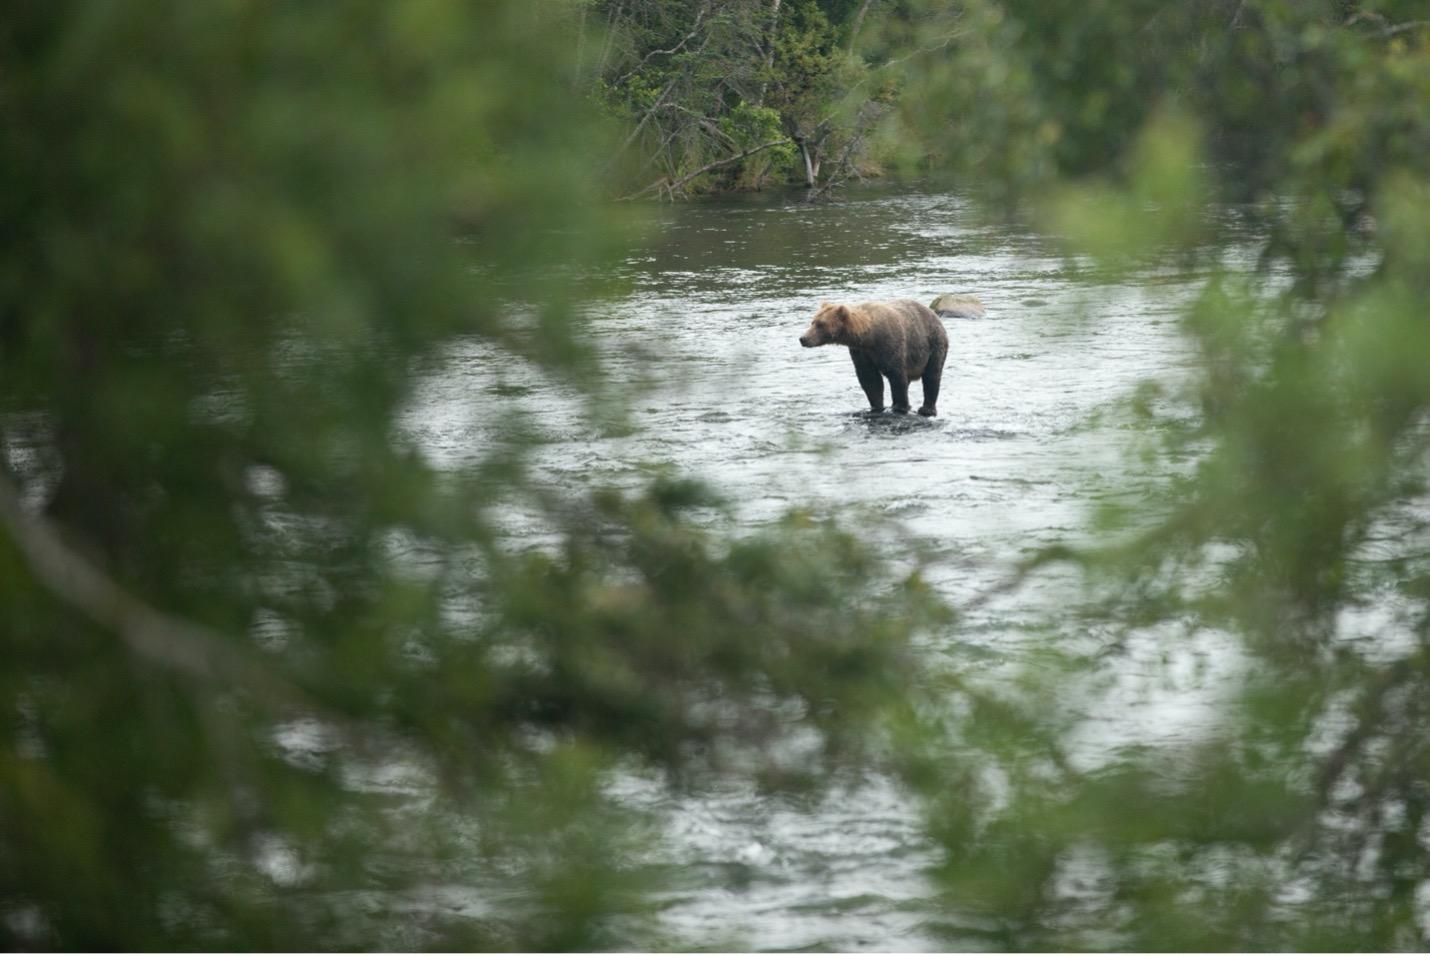 a single brown bear is shrouded by vegetation in Alaska